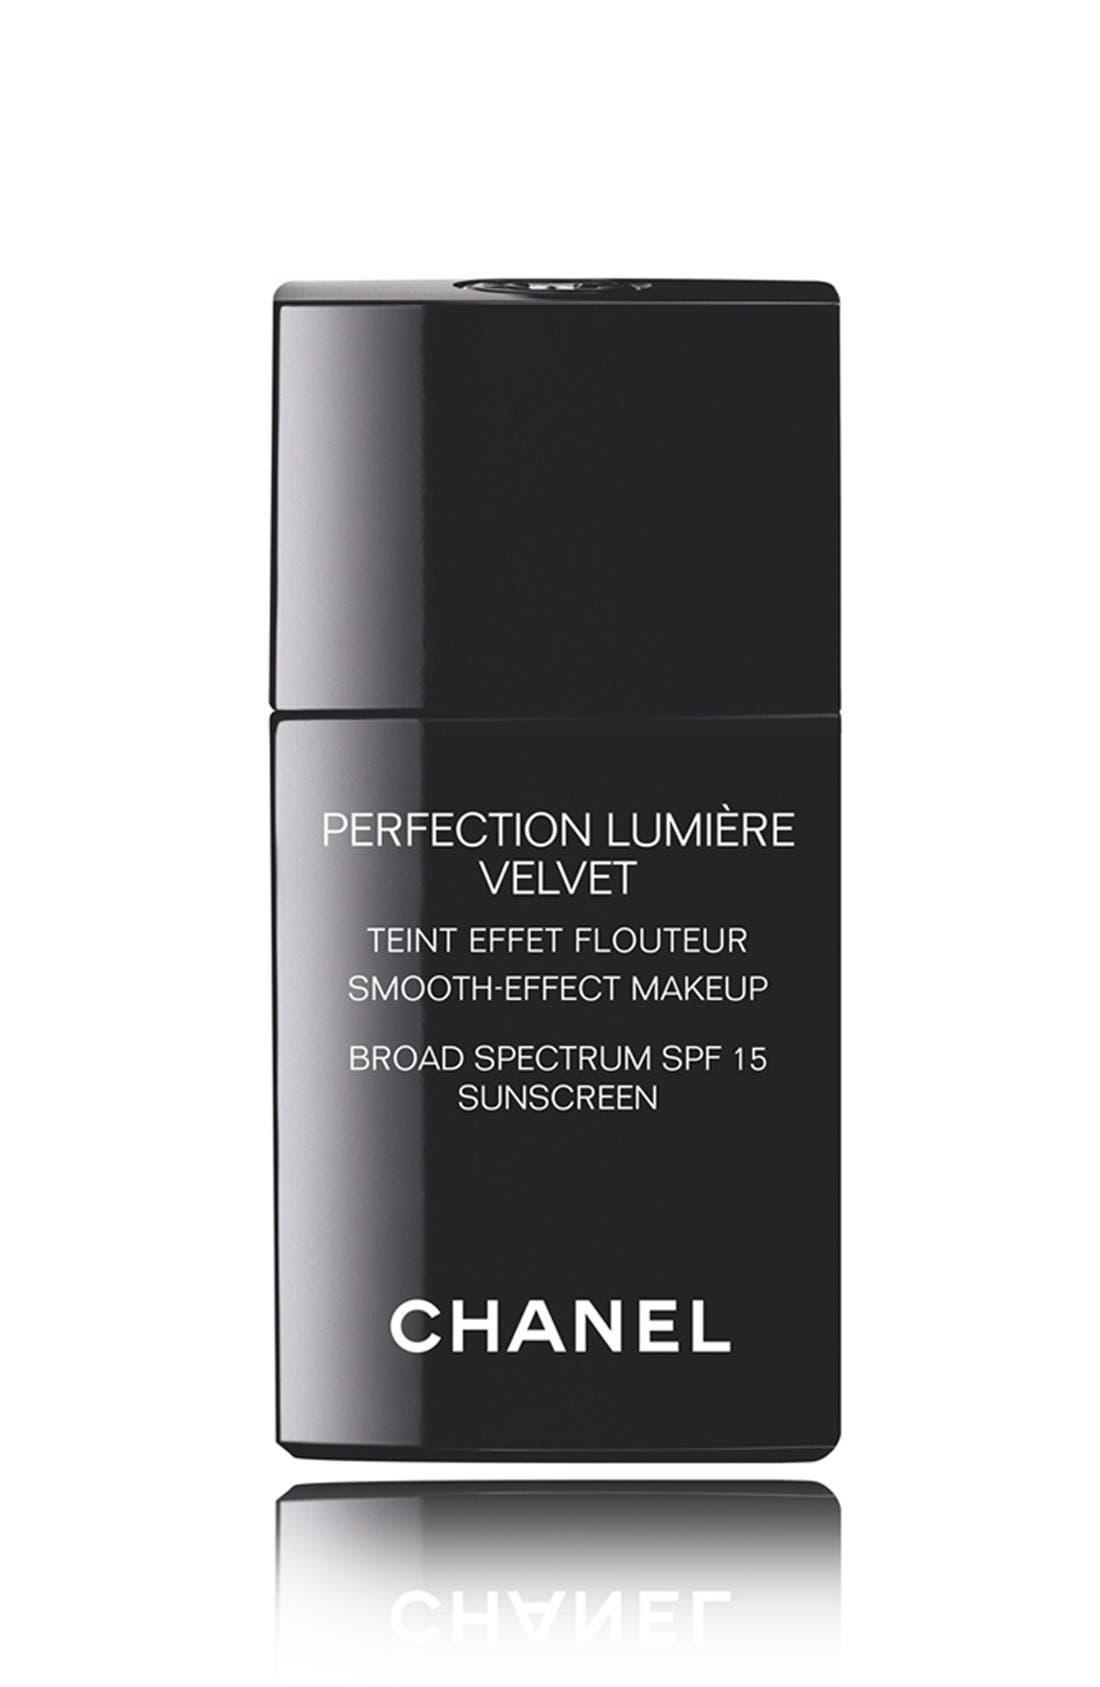 CHANEL PERFECTION LUMIÈRE VELVET  Smooth-Effect Makeup Broad Spectrum SPF 15 Sunscreen